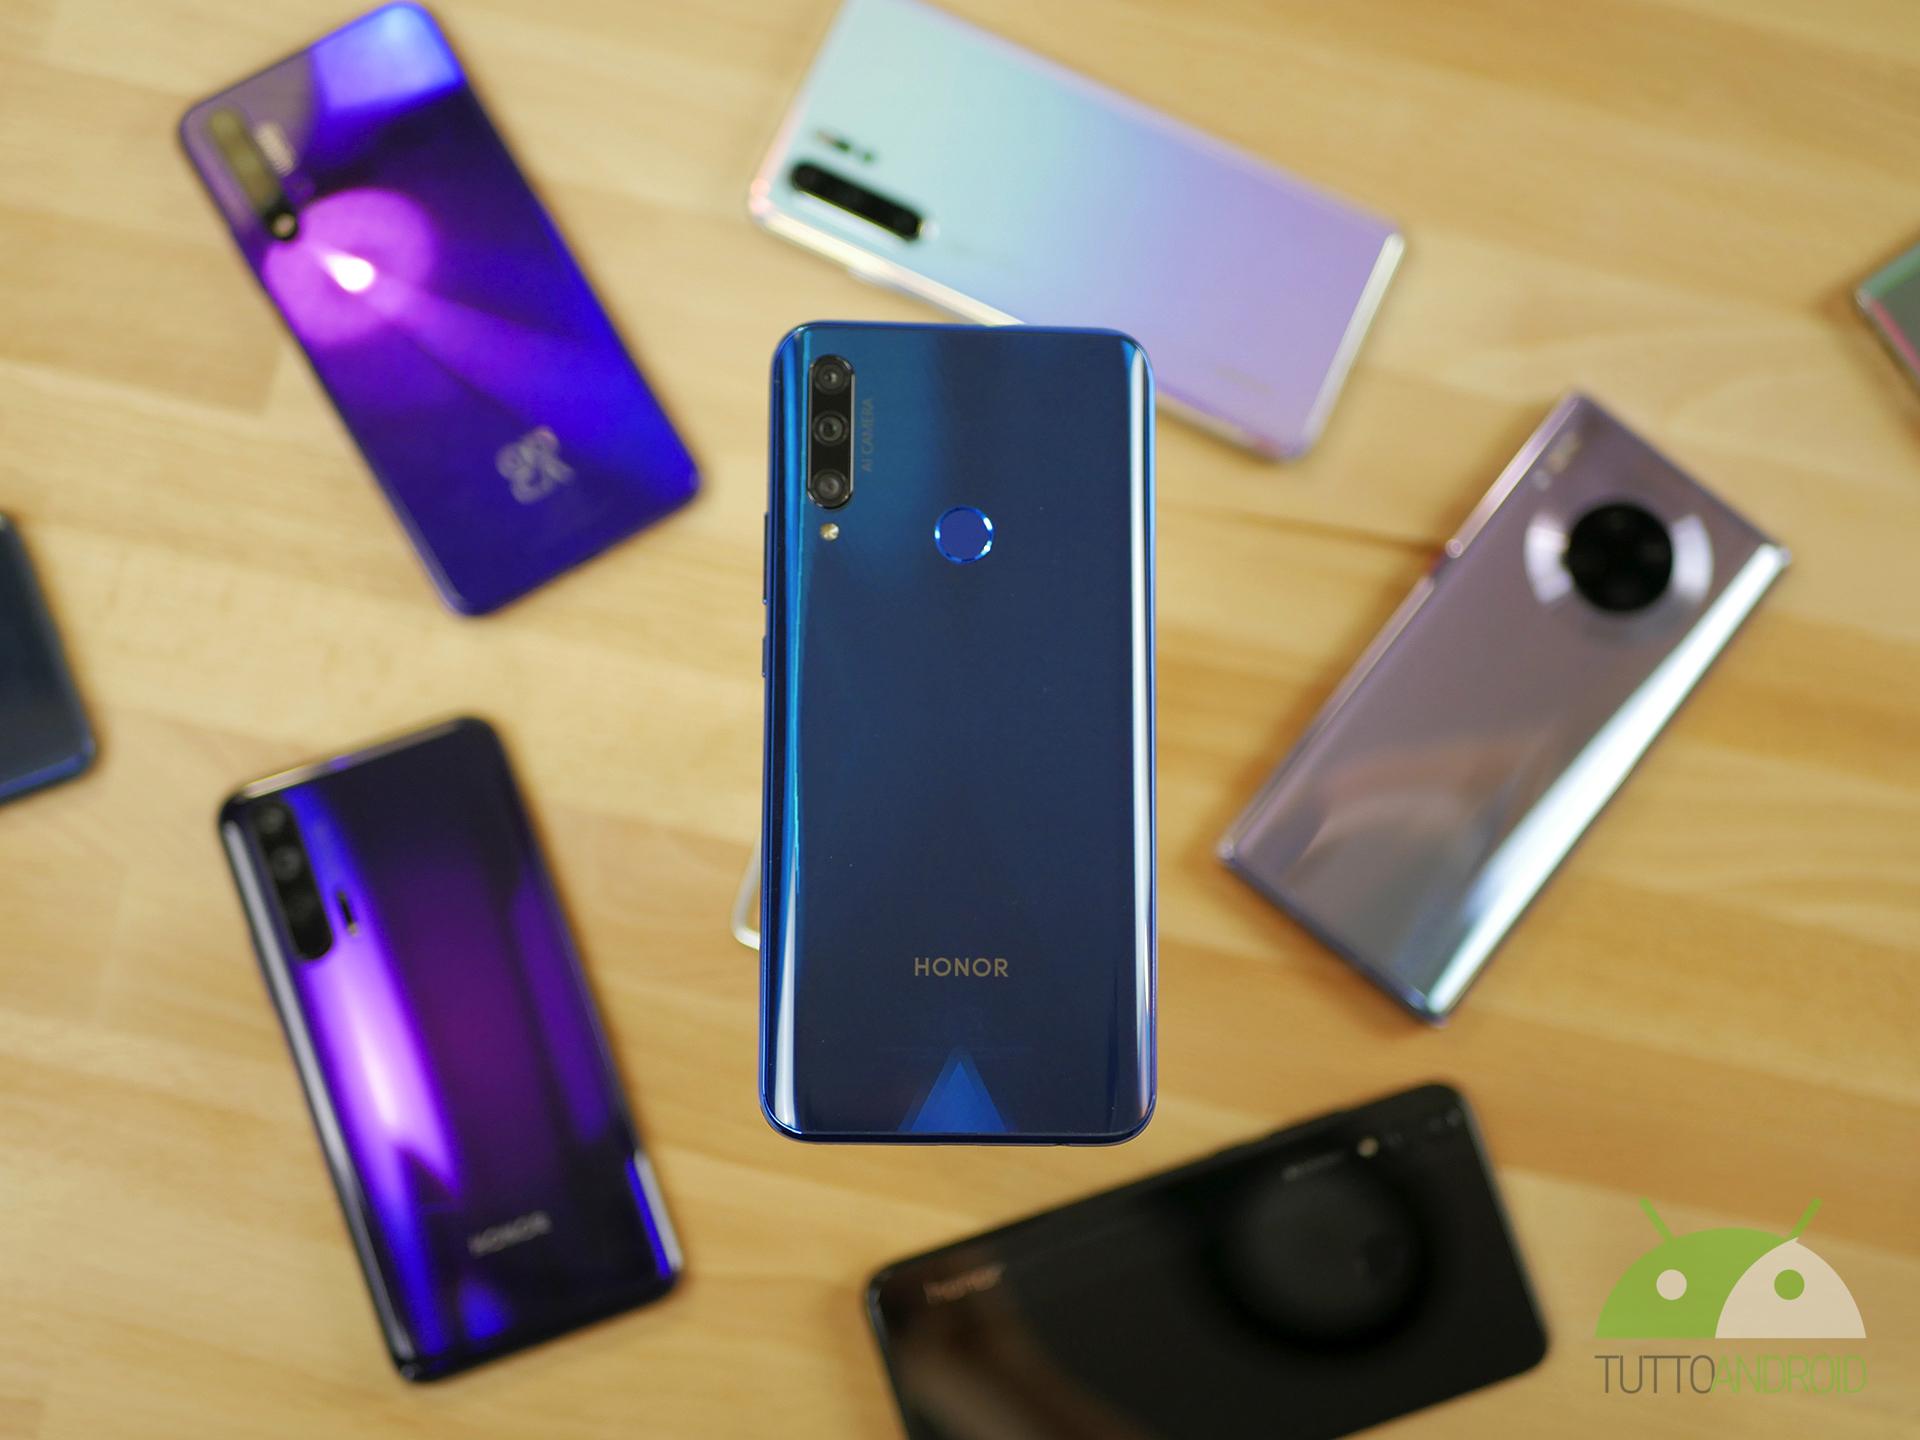 La classifica AnTuTu dei migliori smartphone di fascia alta